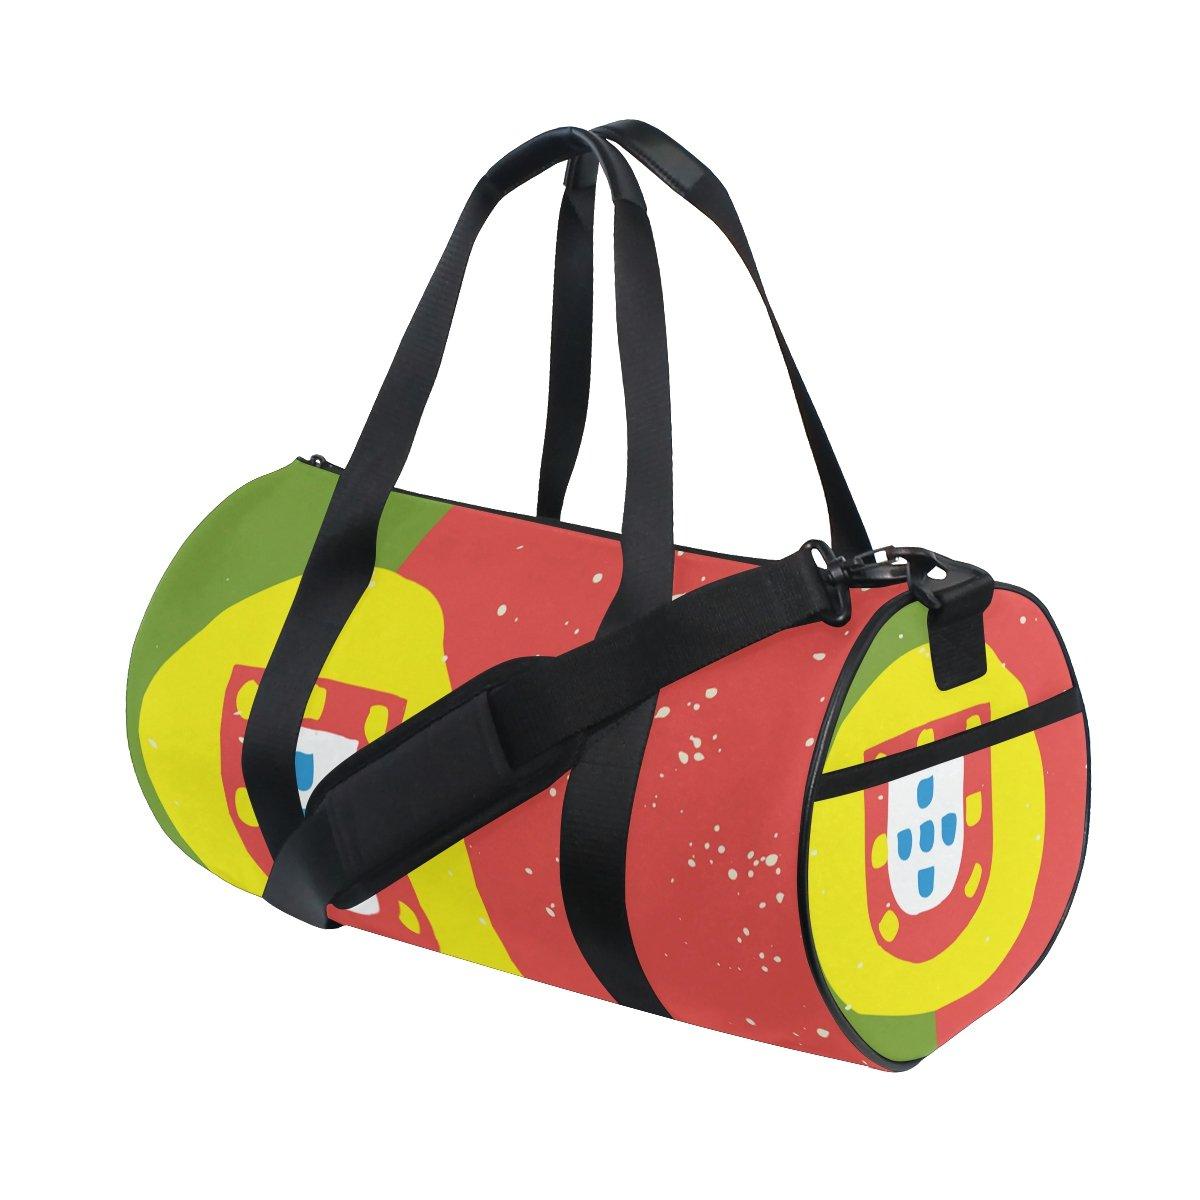 Distressed Portugal Flag Travel Duffel Shoulder Bag ,Sports Gym Fitness Bags